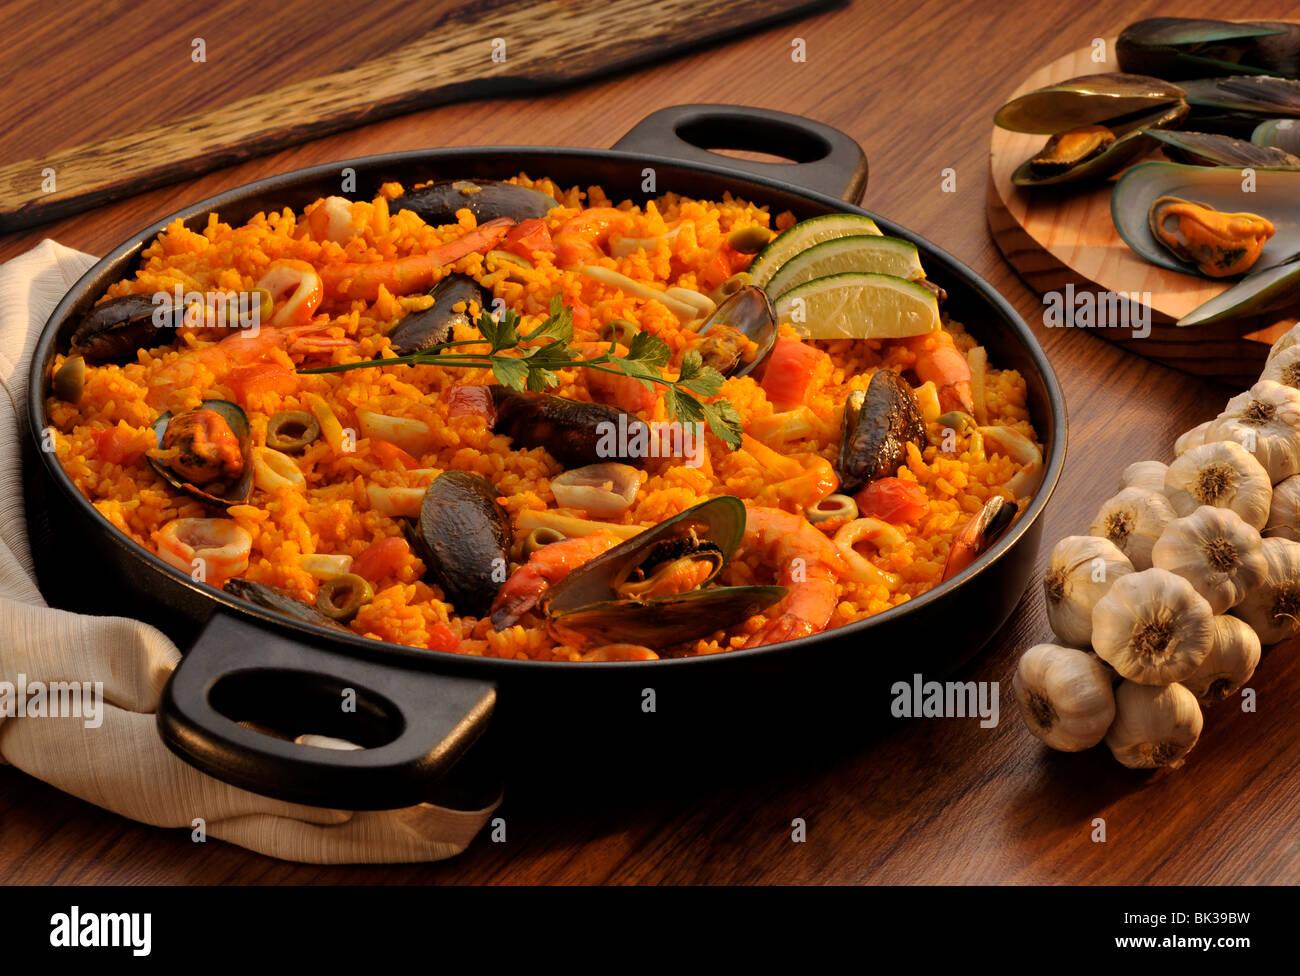 La Paella, un plat de riz espagnol, Espagne, Europe Photo Stock